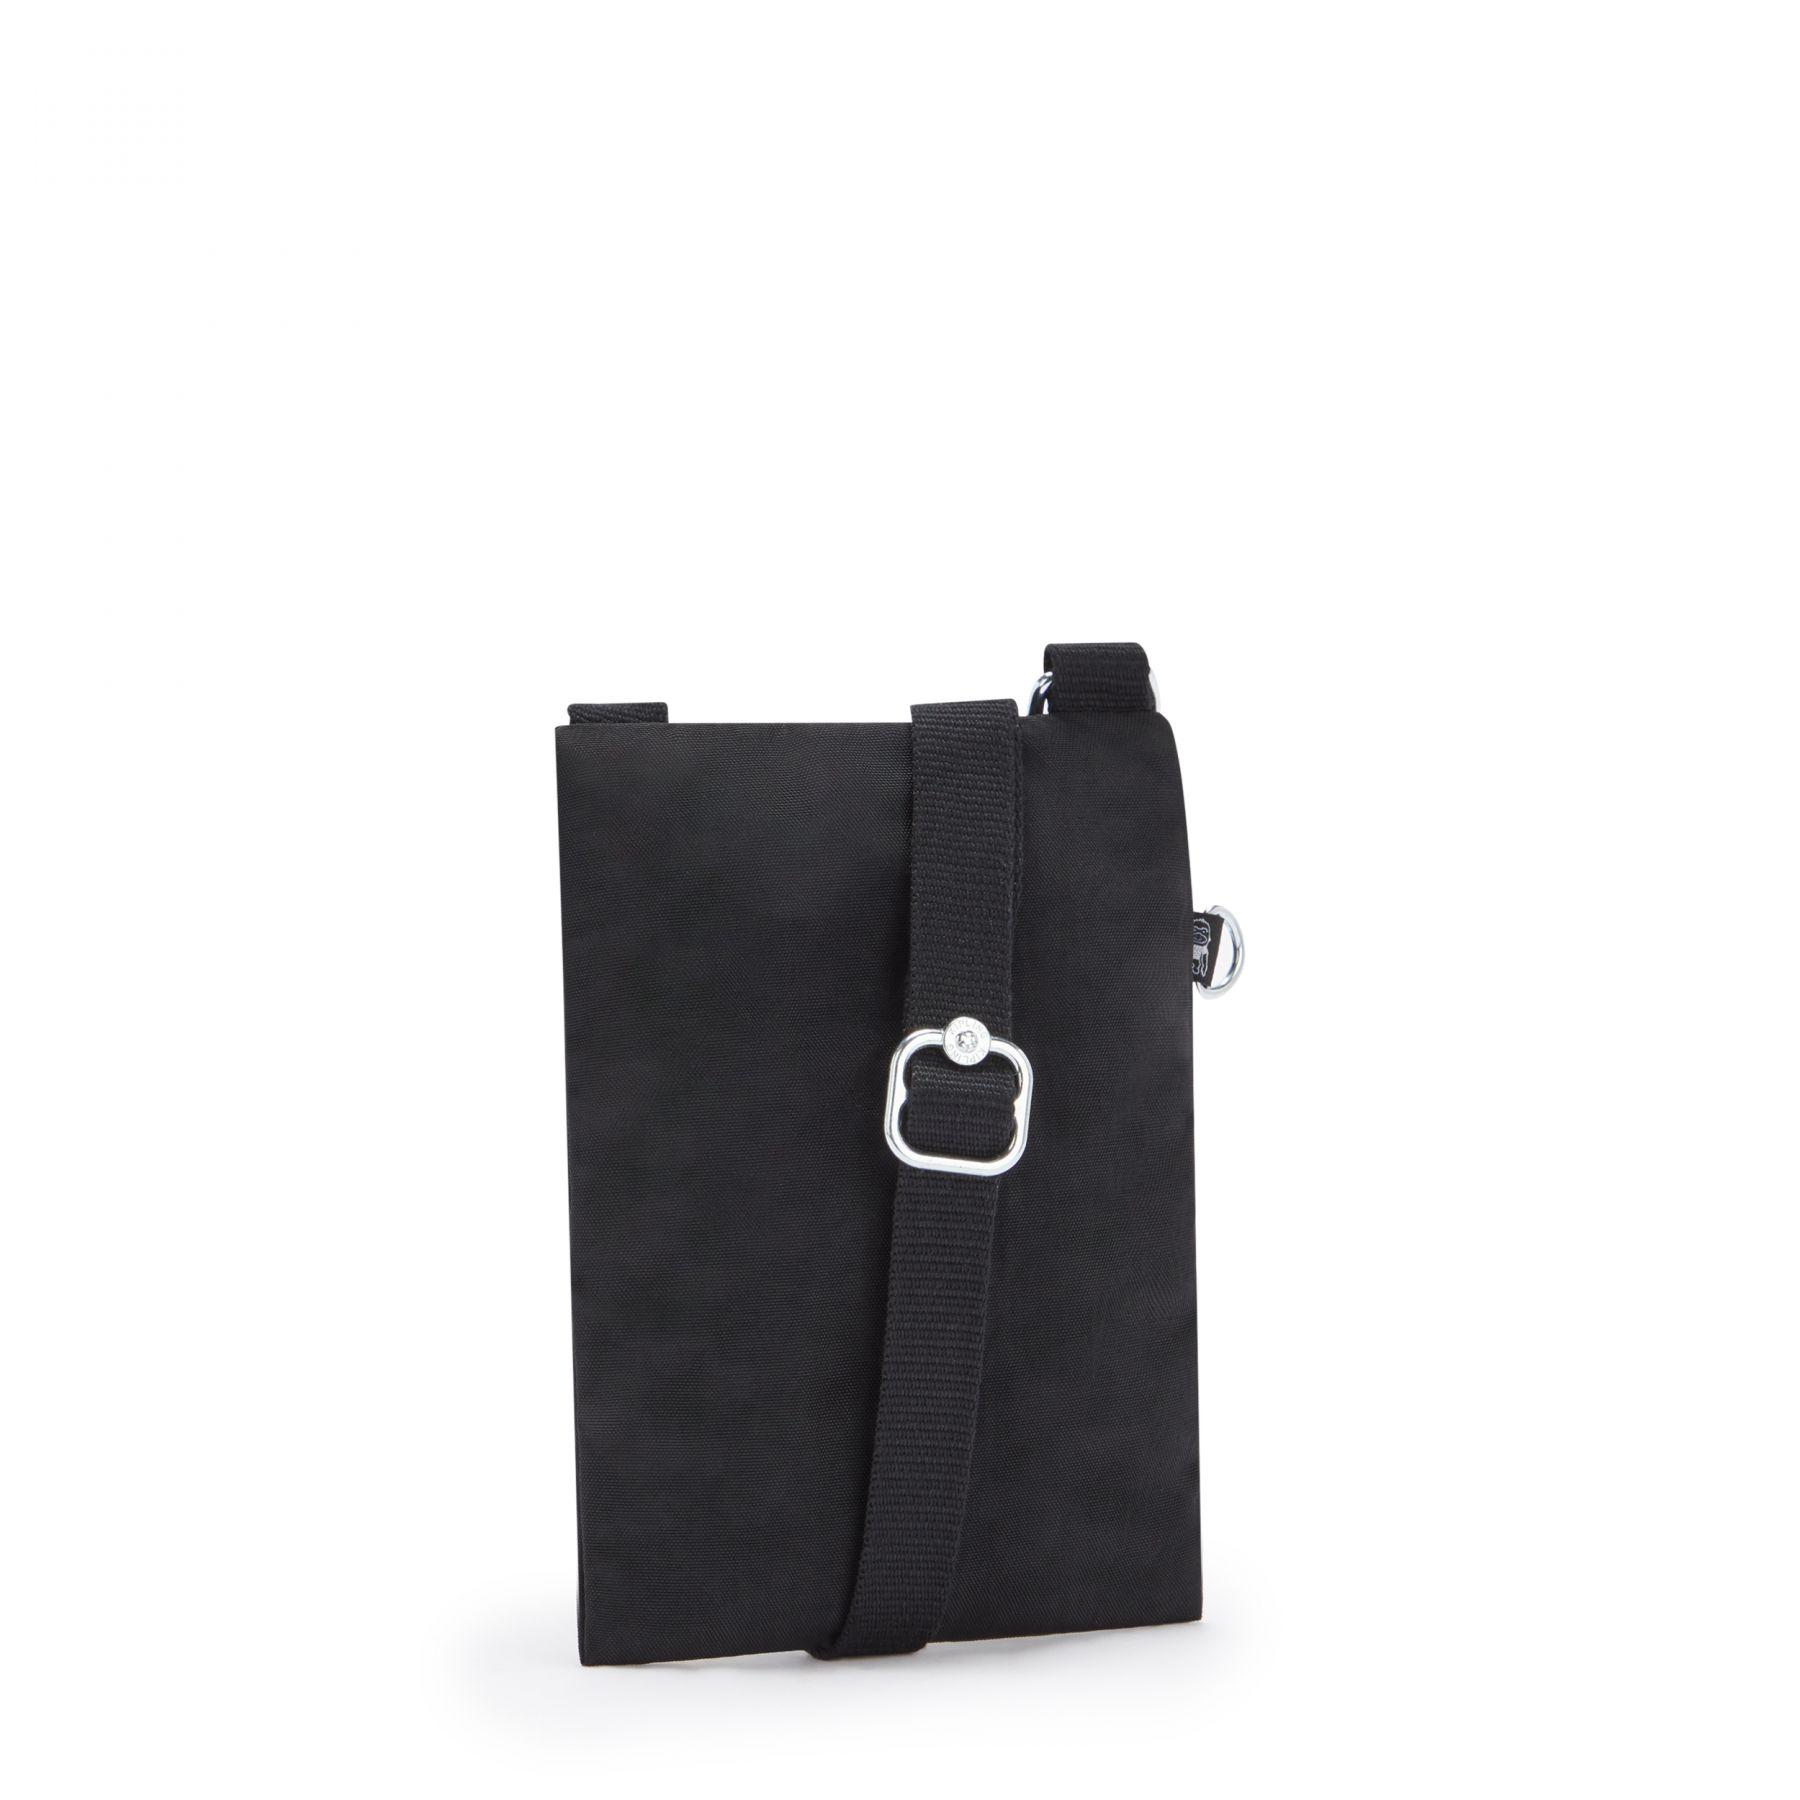 AFIA LITE BAGS by Kipling